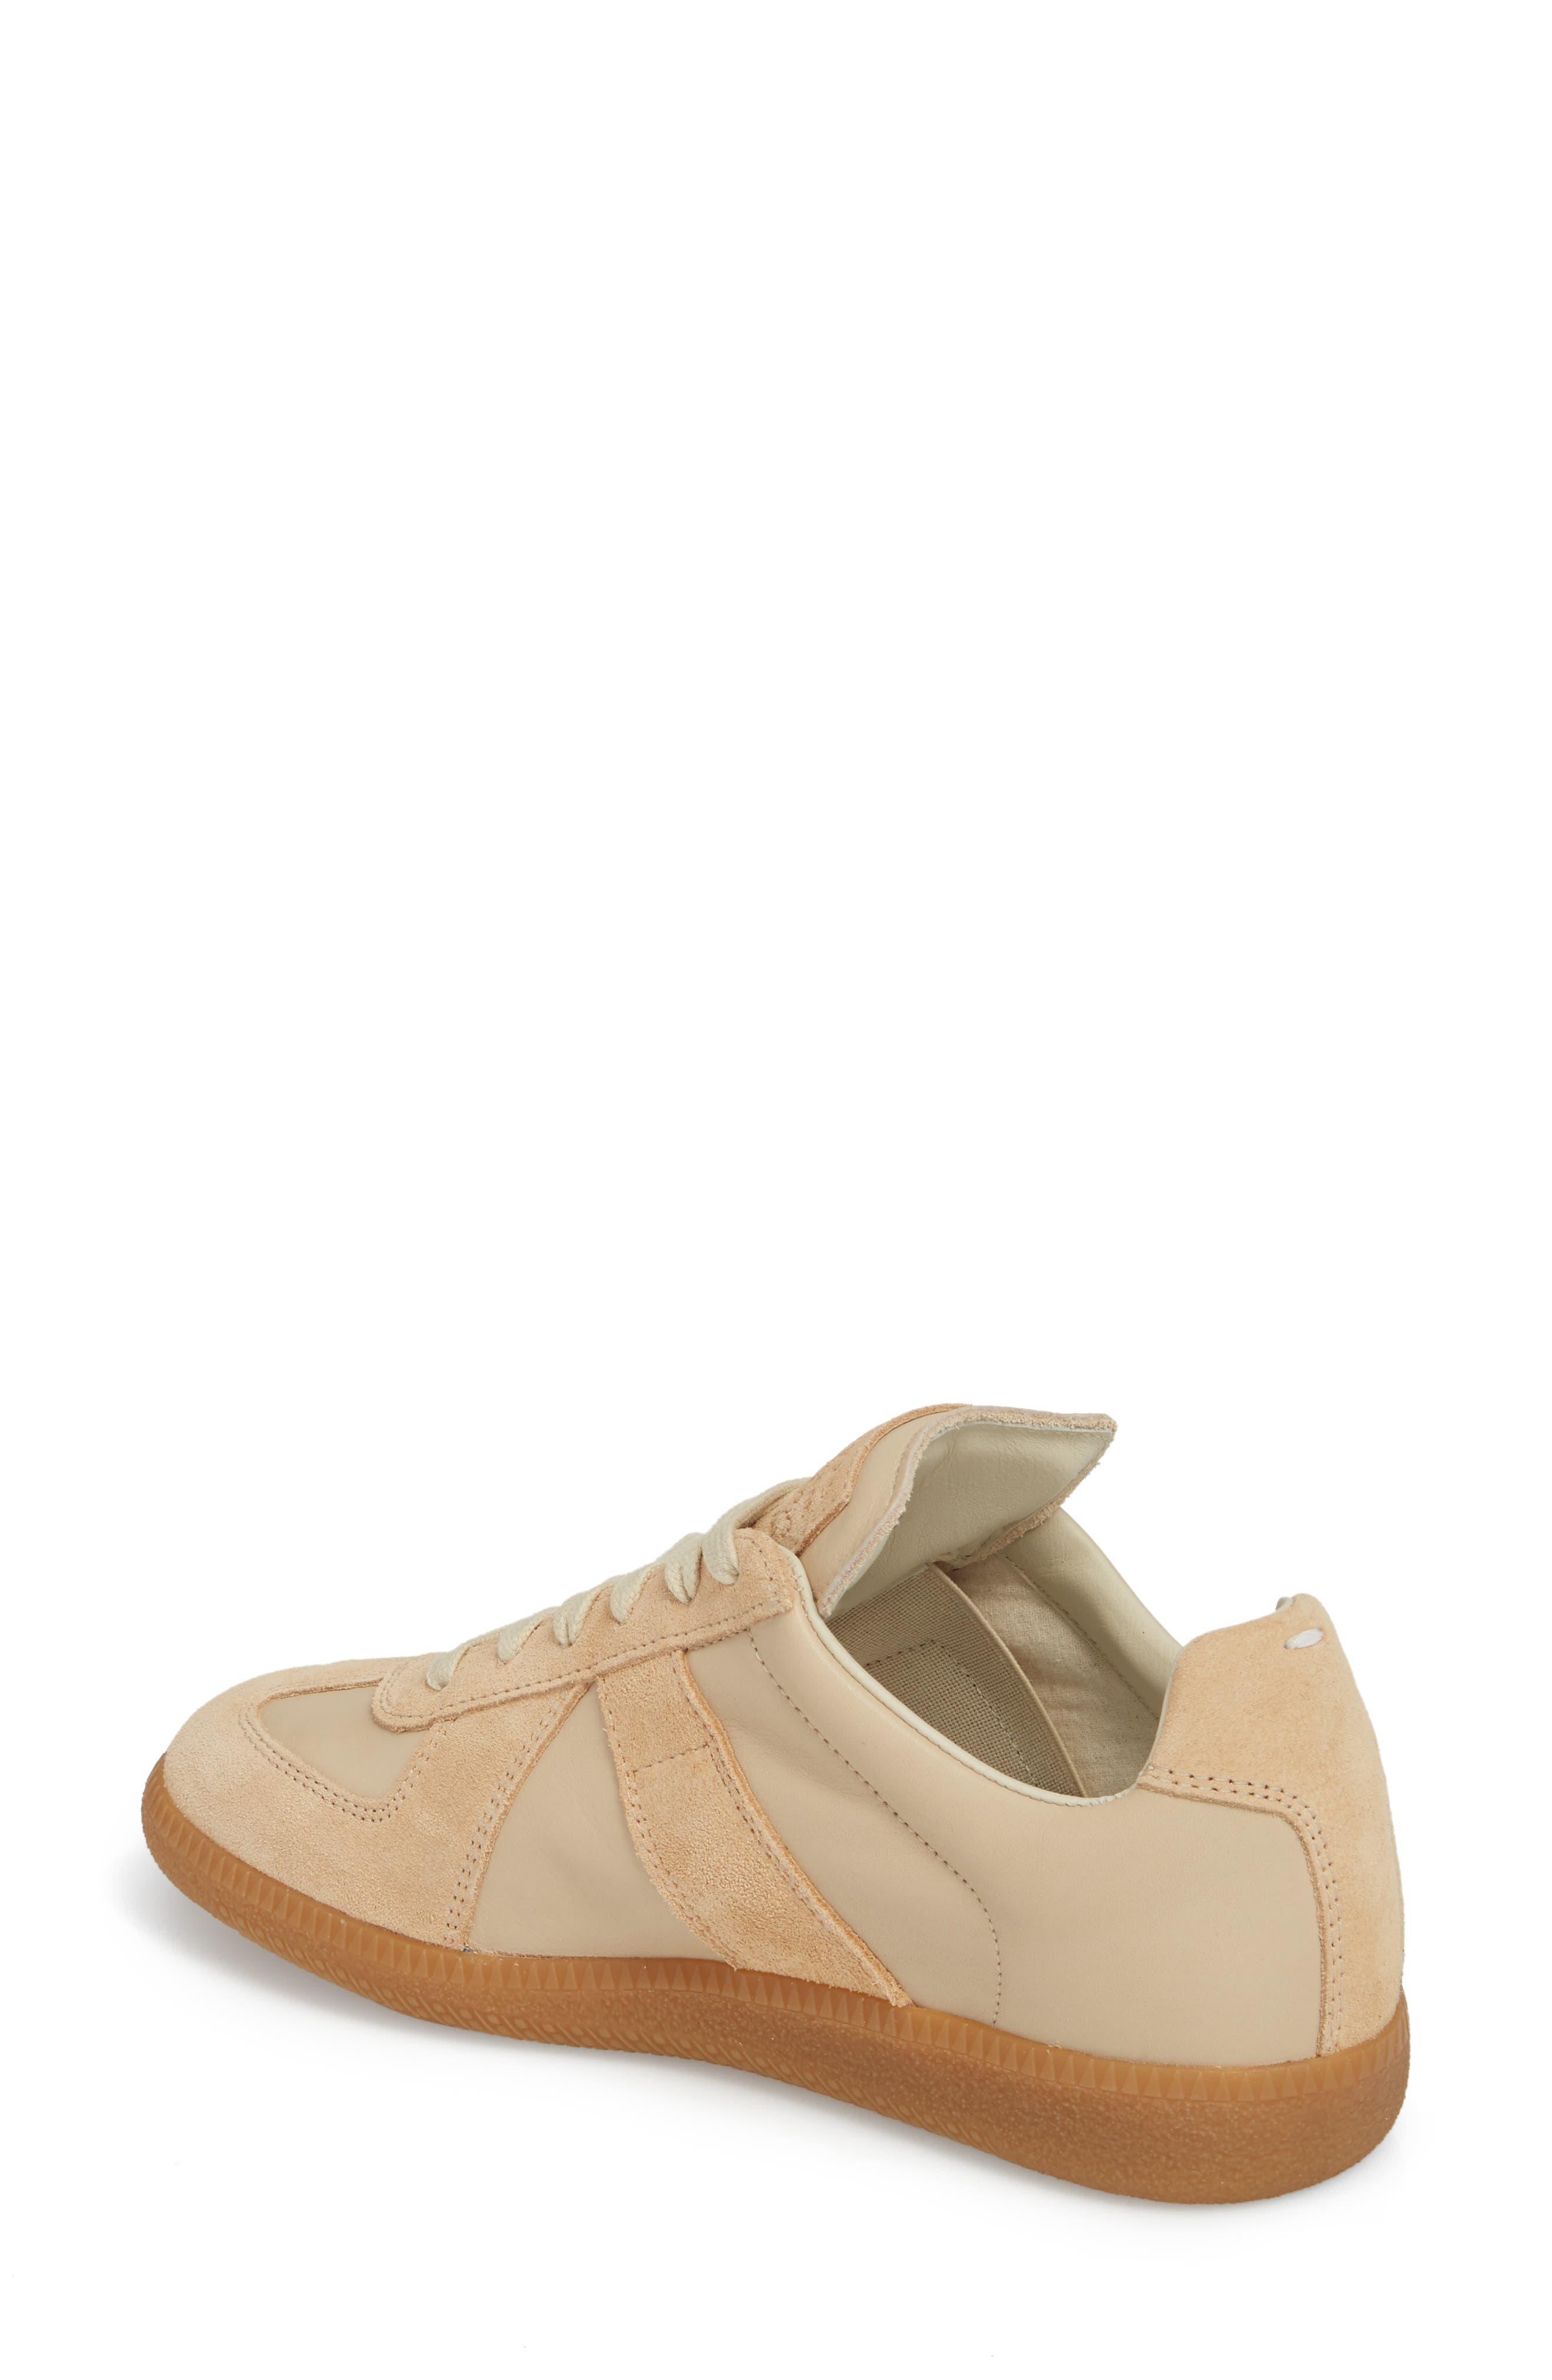 MAISON MARGIELA,                             Replica Sneaker,                             Alternate thumbnail 2, color,                             262